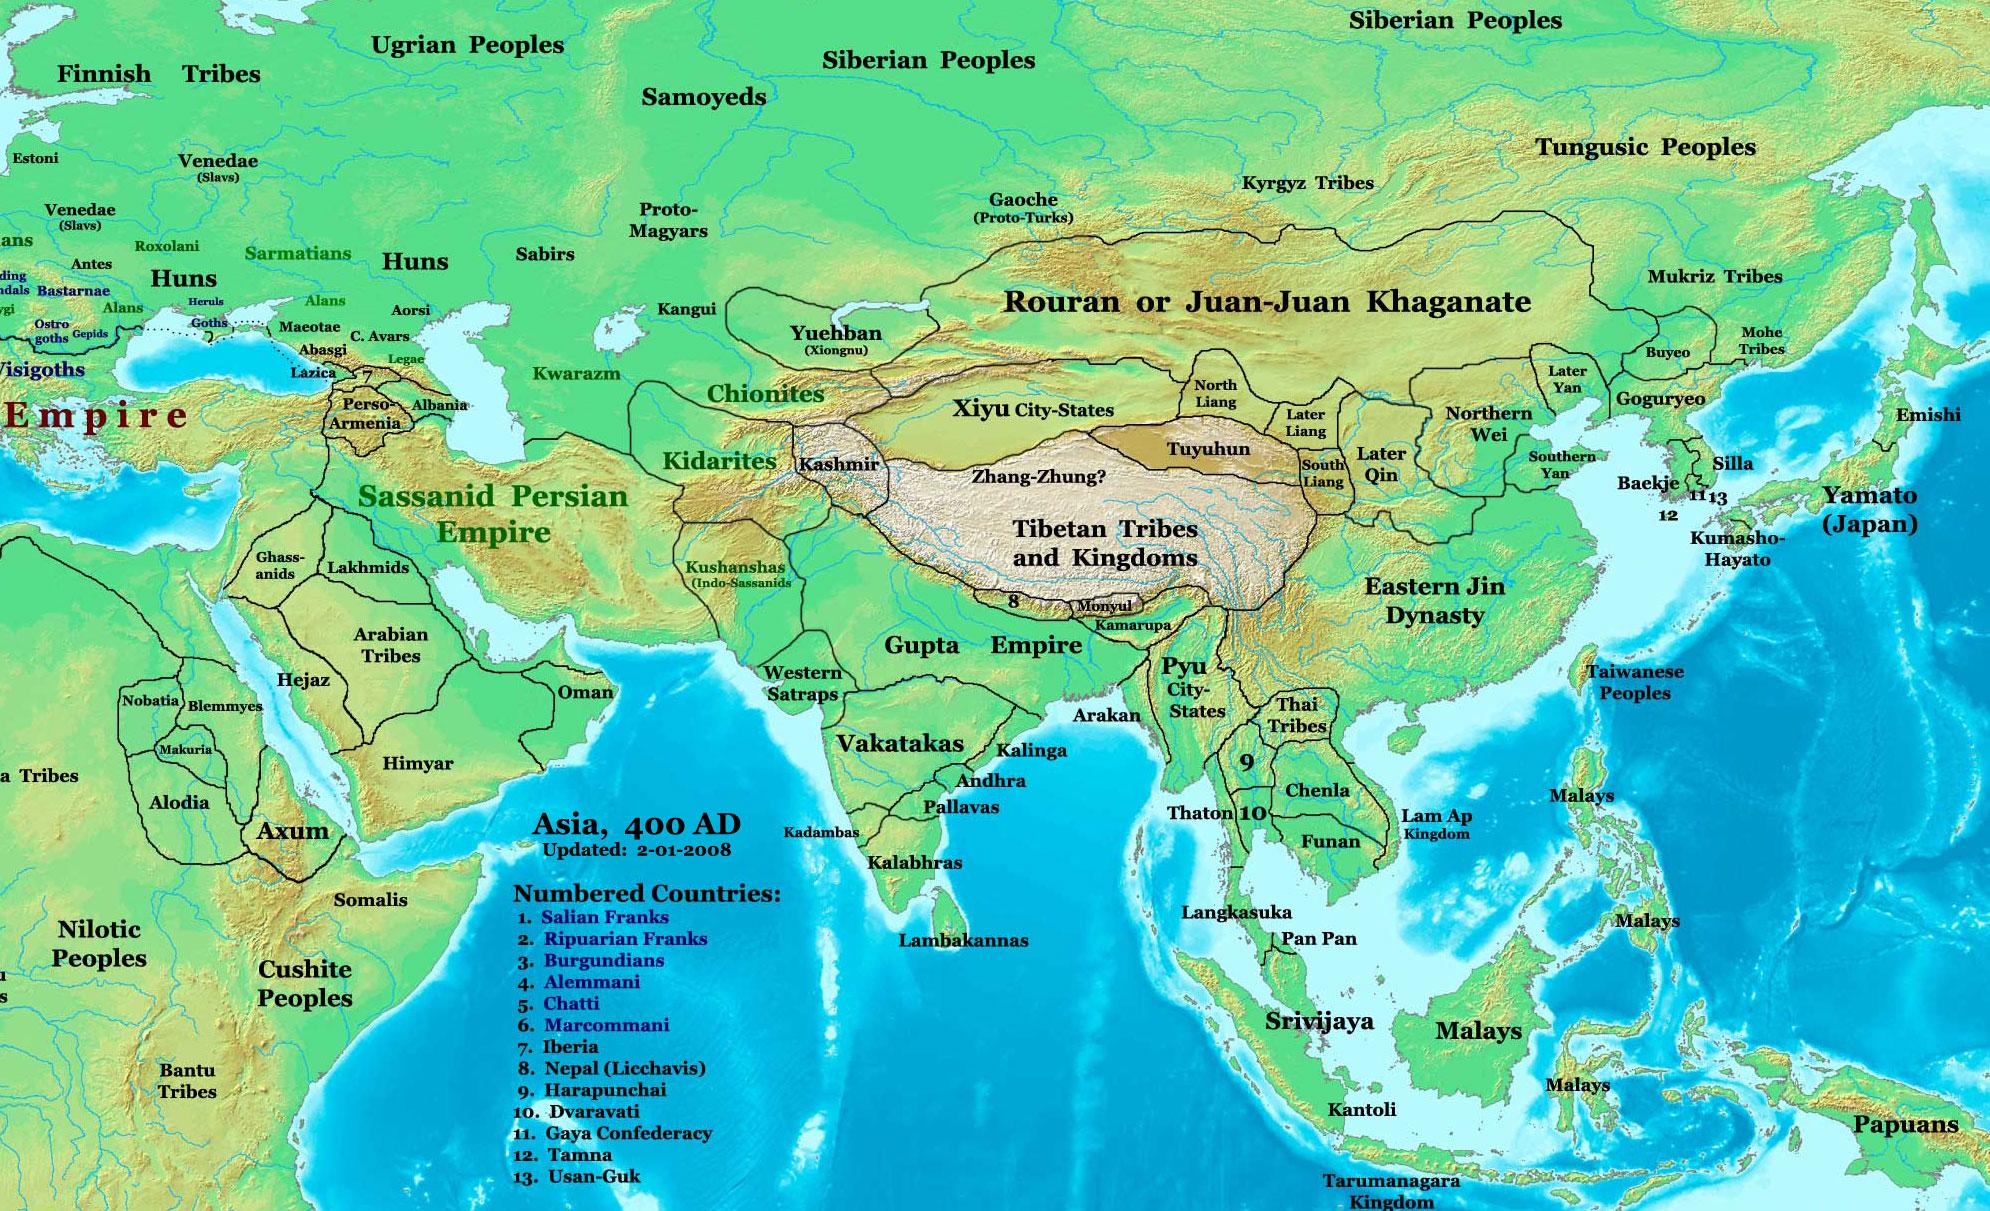 https://i2.wp.com/upload.wikimedia.org/wikipedia/commons/8/80/Asia_400ad.jpg